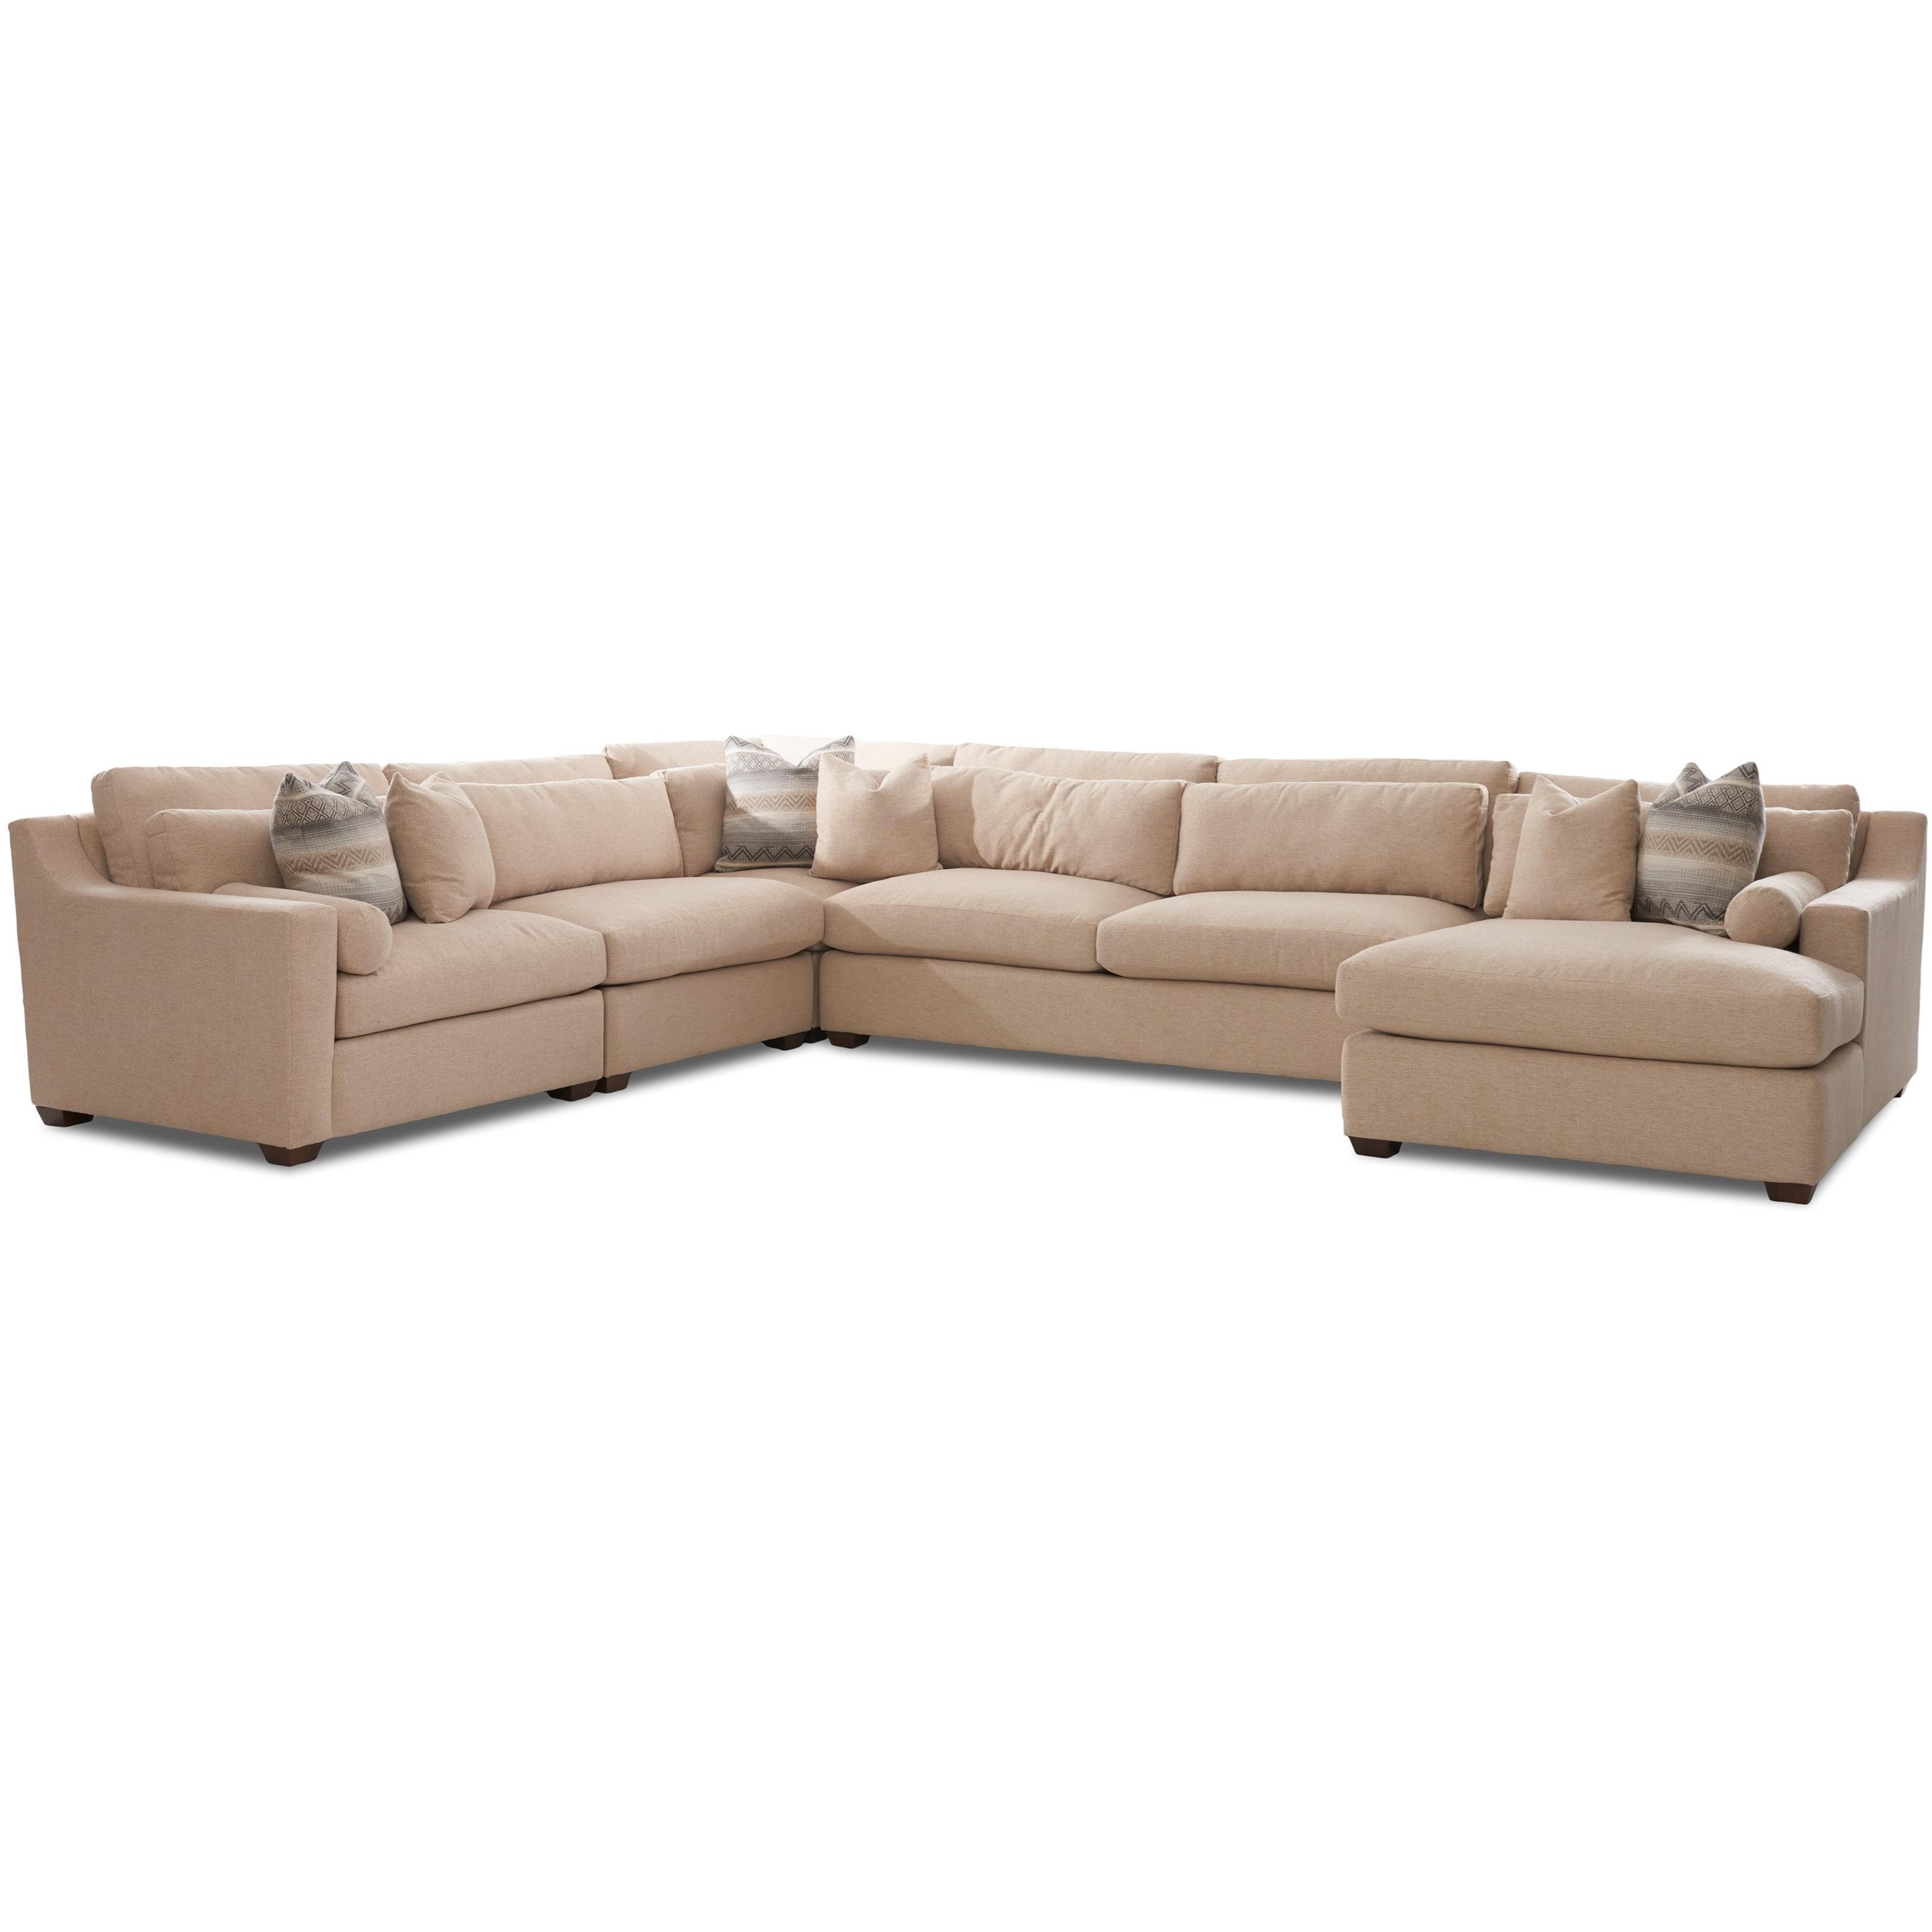 Roan Sofa Sectional